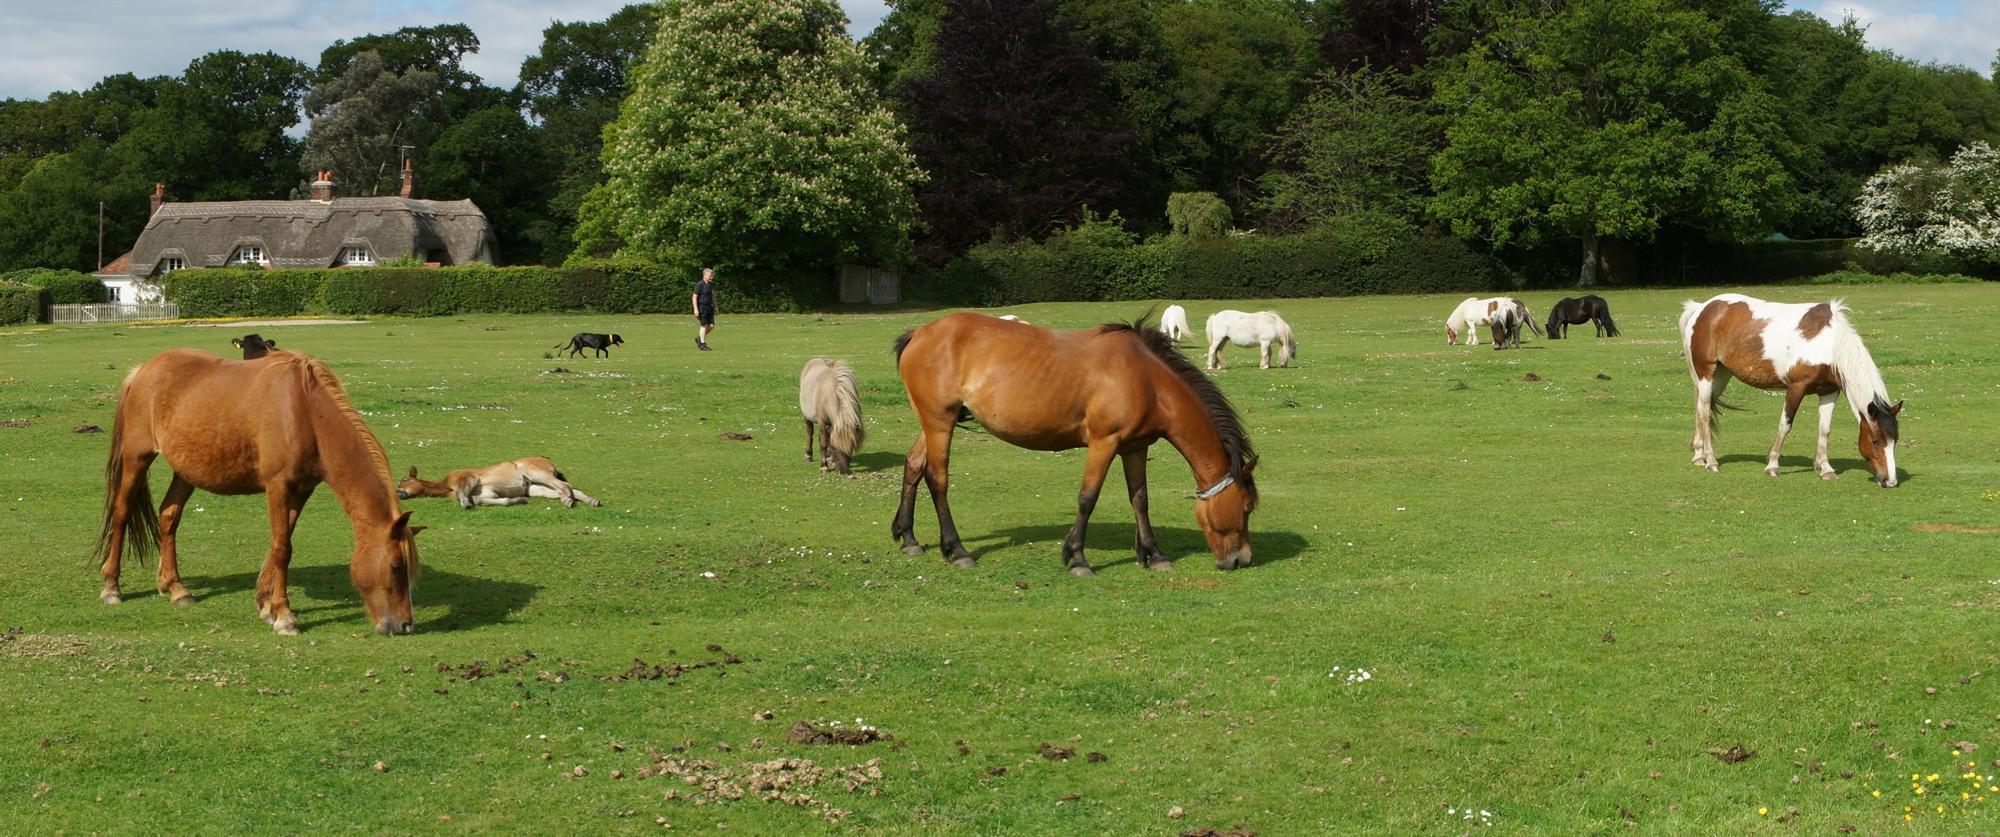 Horses on the Common (© 2018 Bill Shepley)